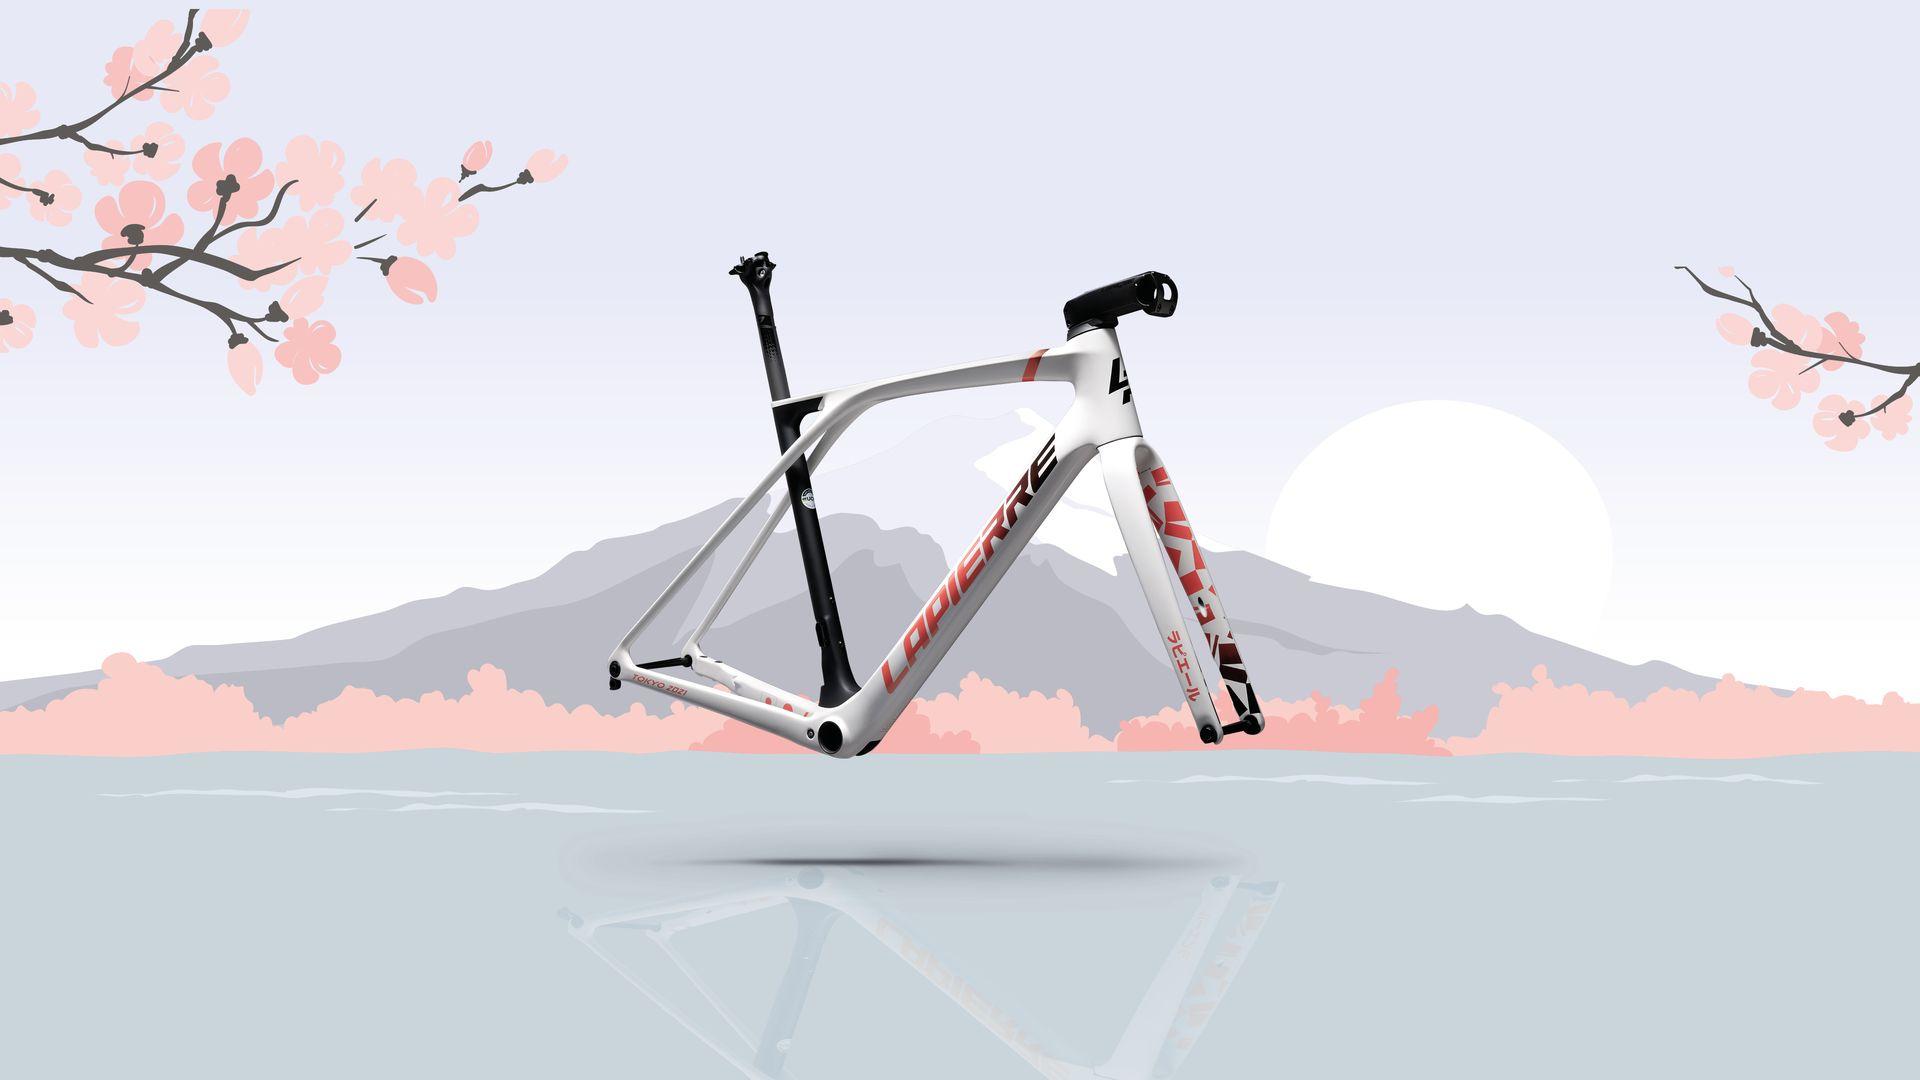 Lapierre Xelius SL3 Sakura for Tokyo Olympics - japanese background